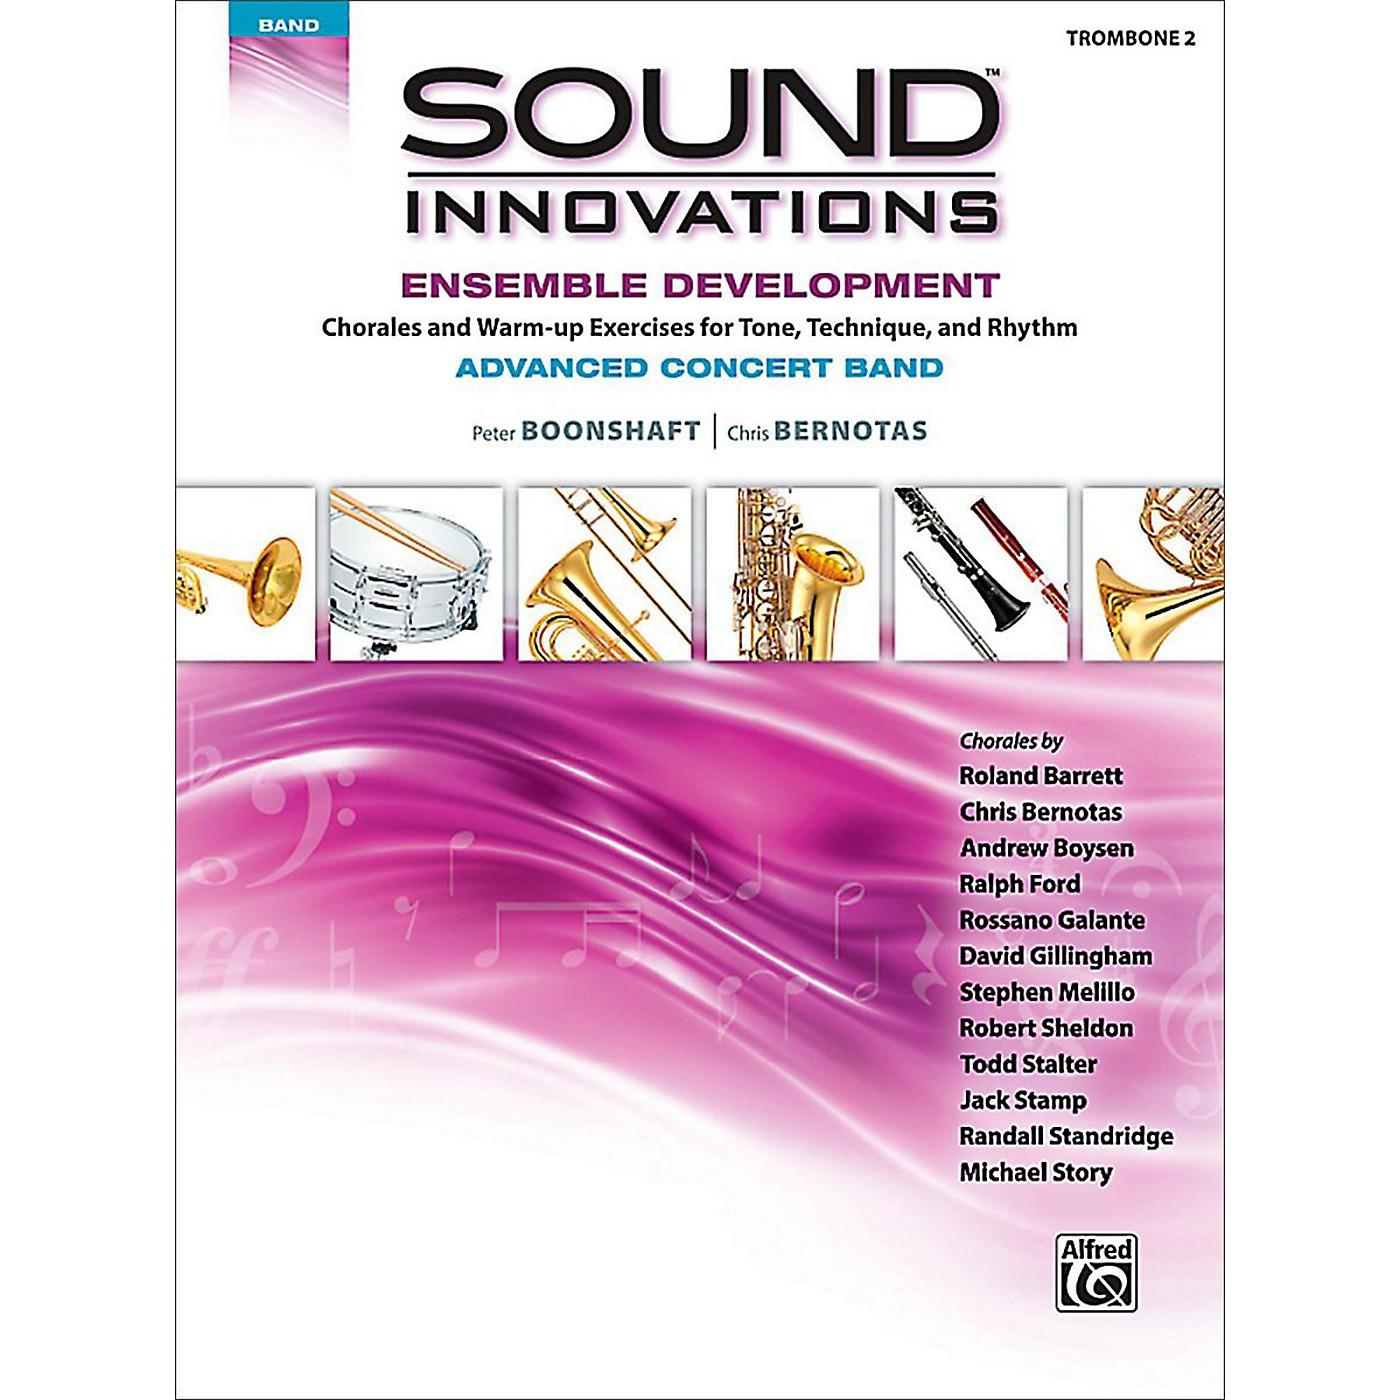 Alfred Sound Innovations Concert Band Ensemble Development Advanced Trombone 2 thumbnail